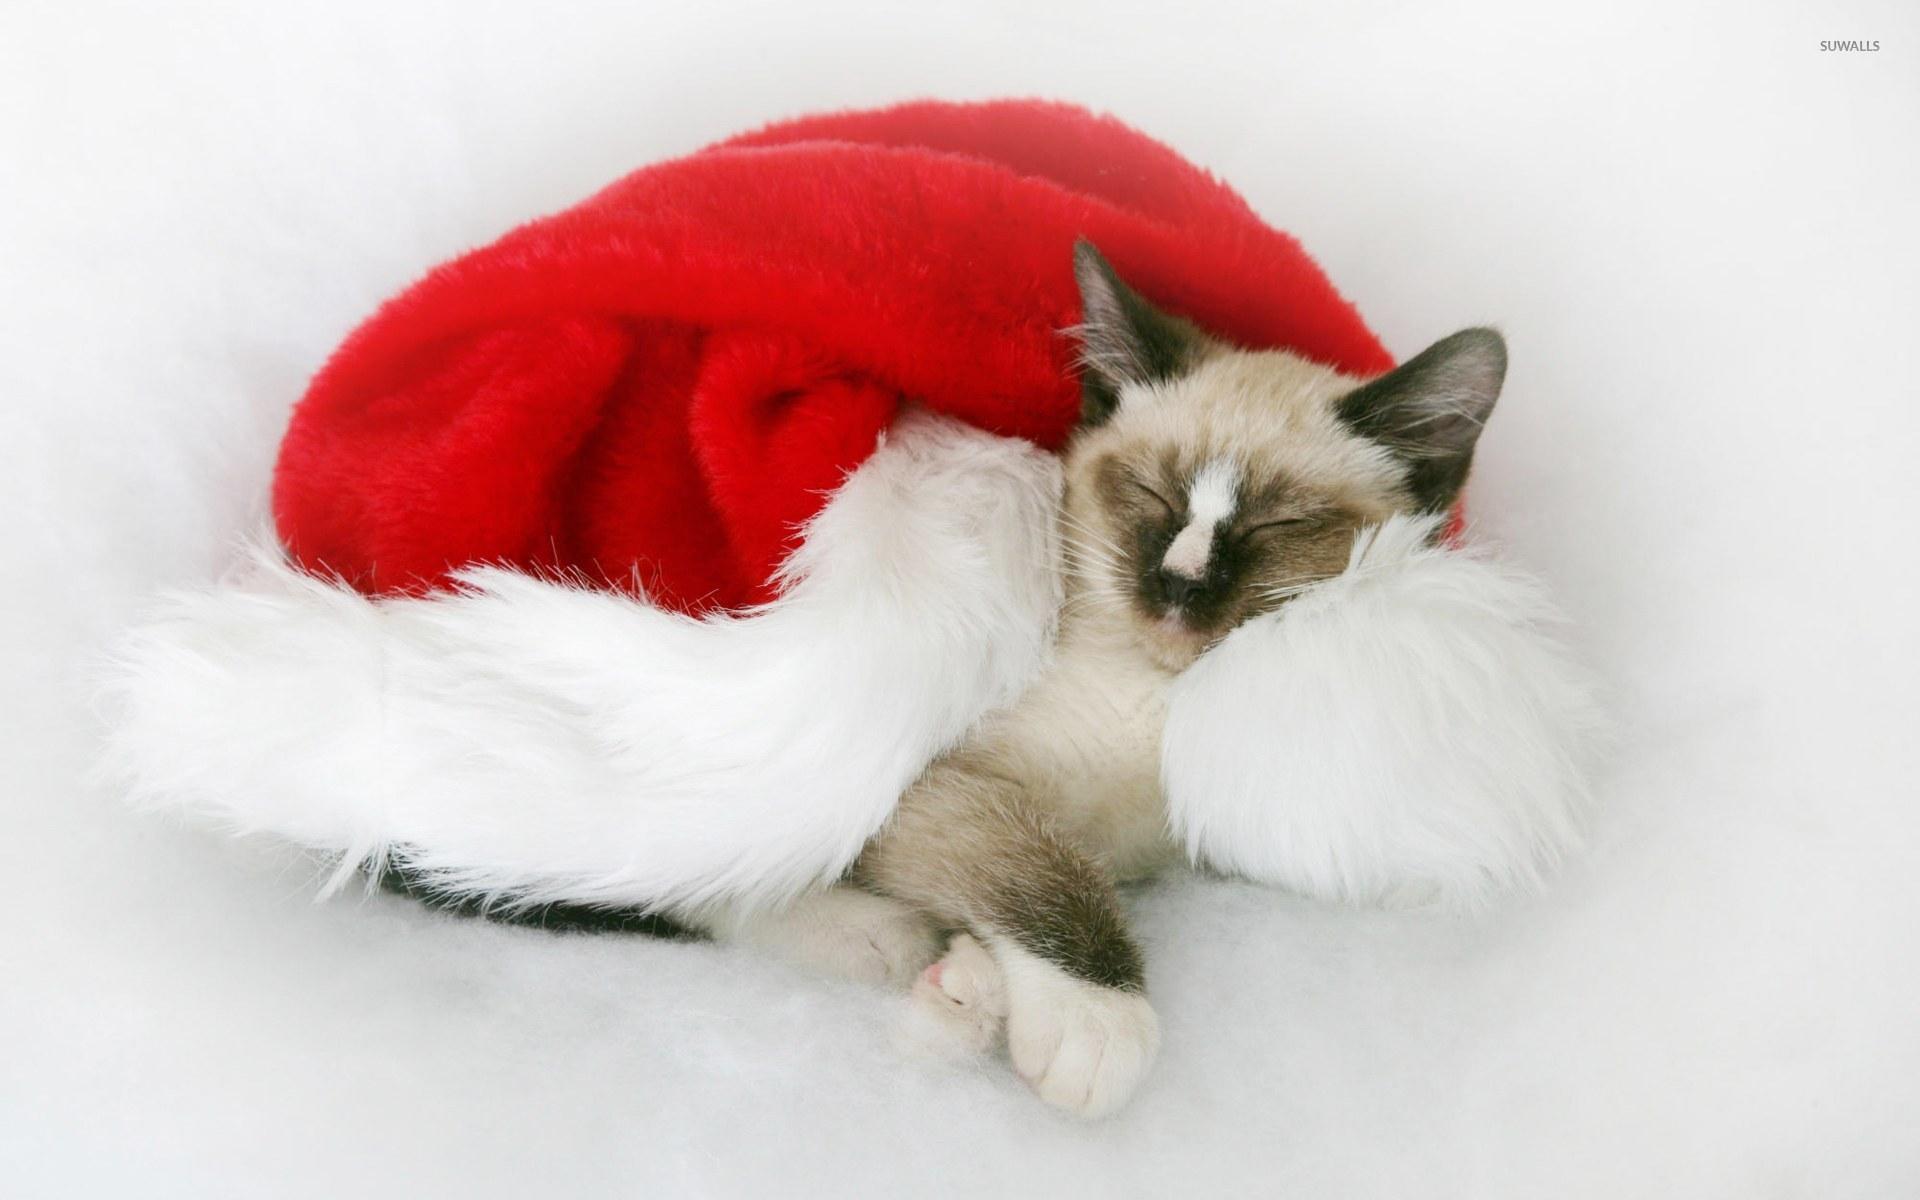 Christmas Kitten Wallpaper Animal Wallpapers 9981